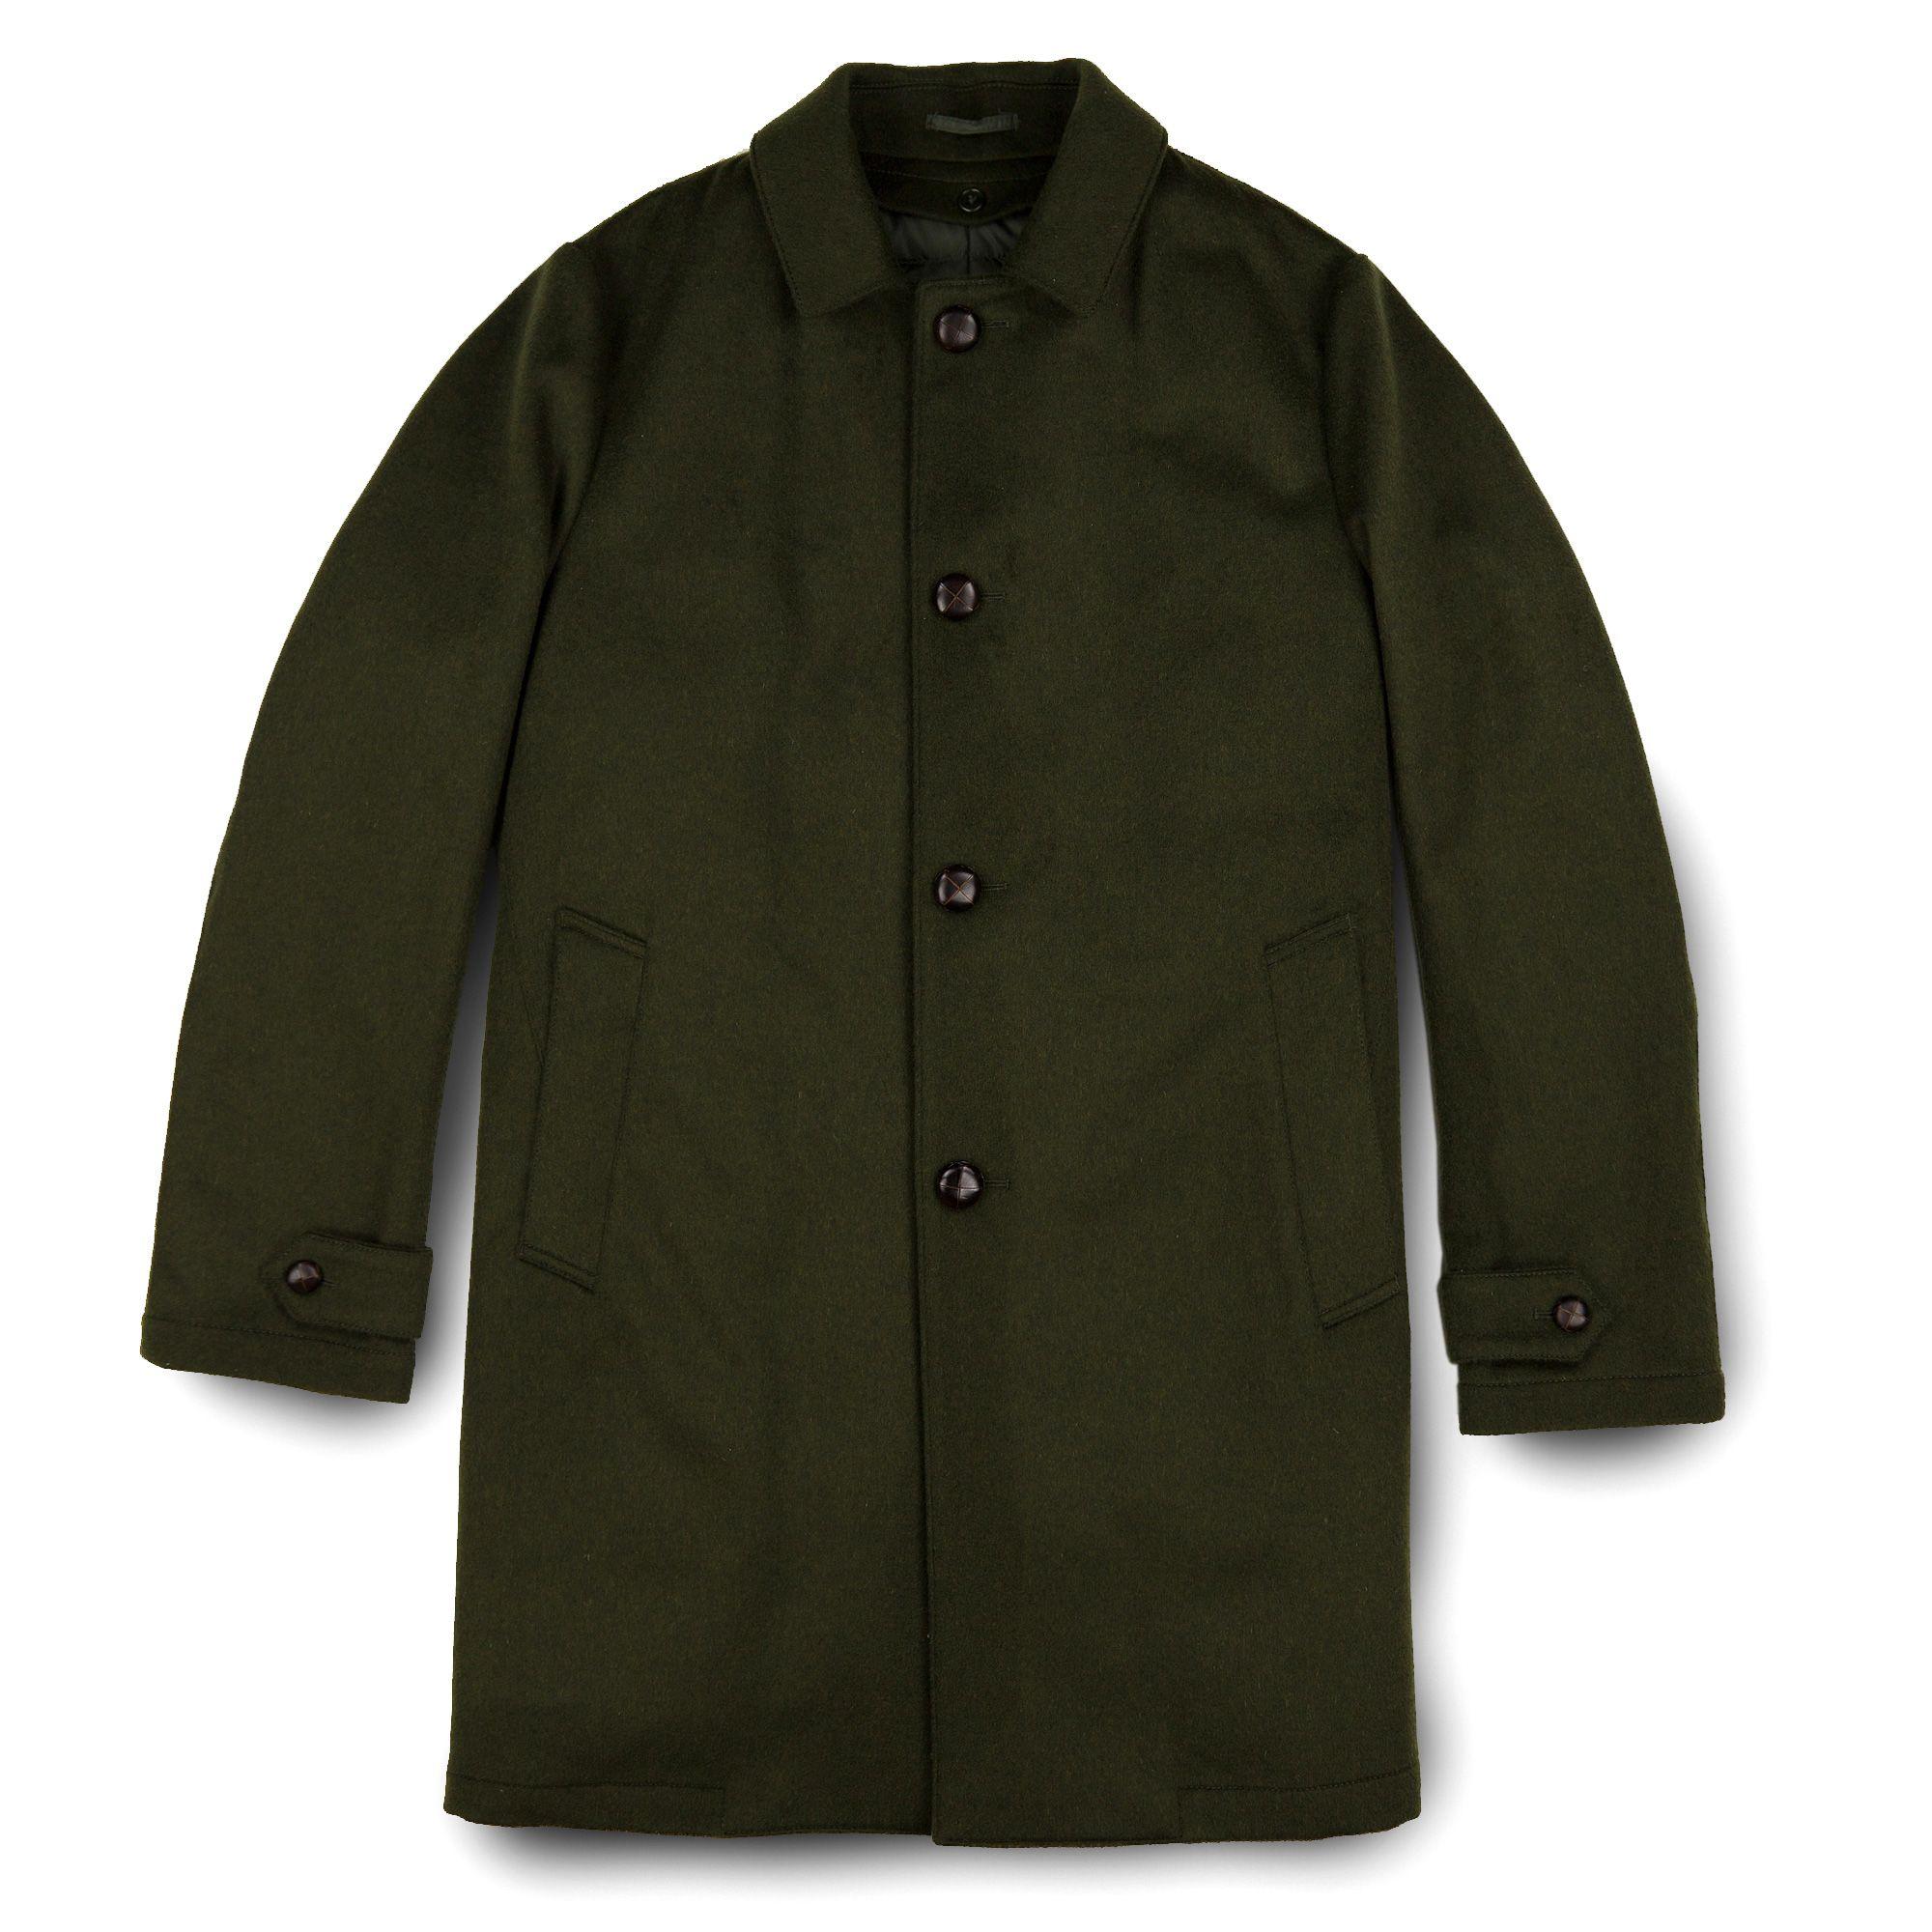 84c7b8535c7f5 Aspesi Perfetto Loden Coat | Coats | Wool coat, Coat, Wool